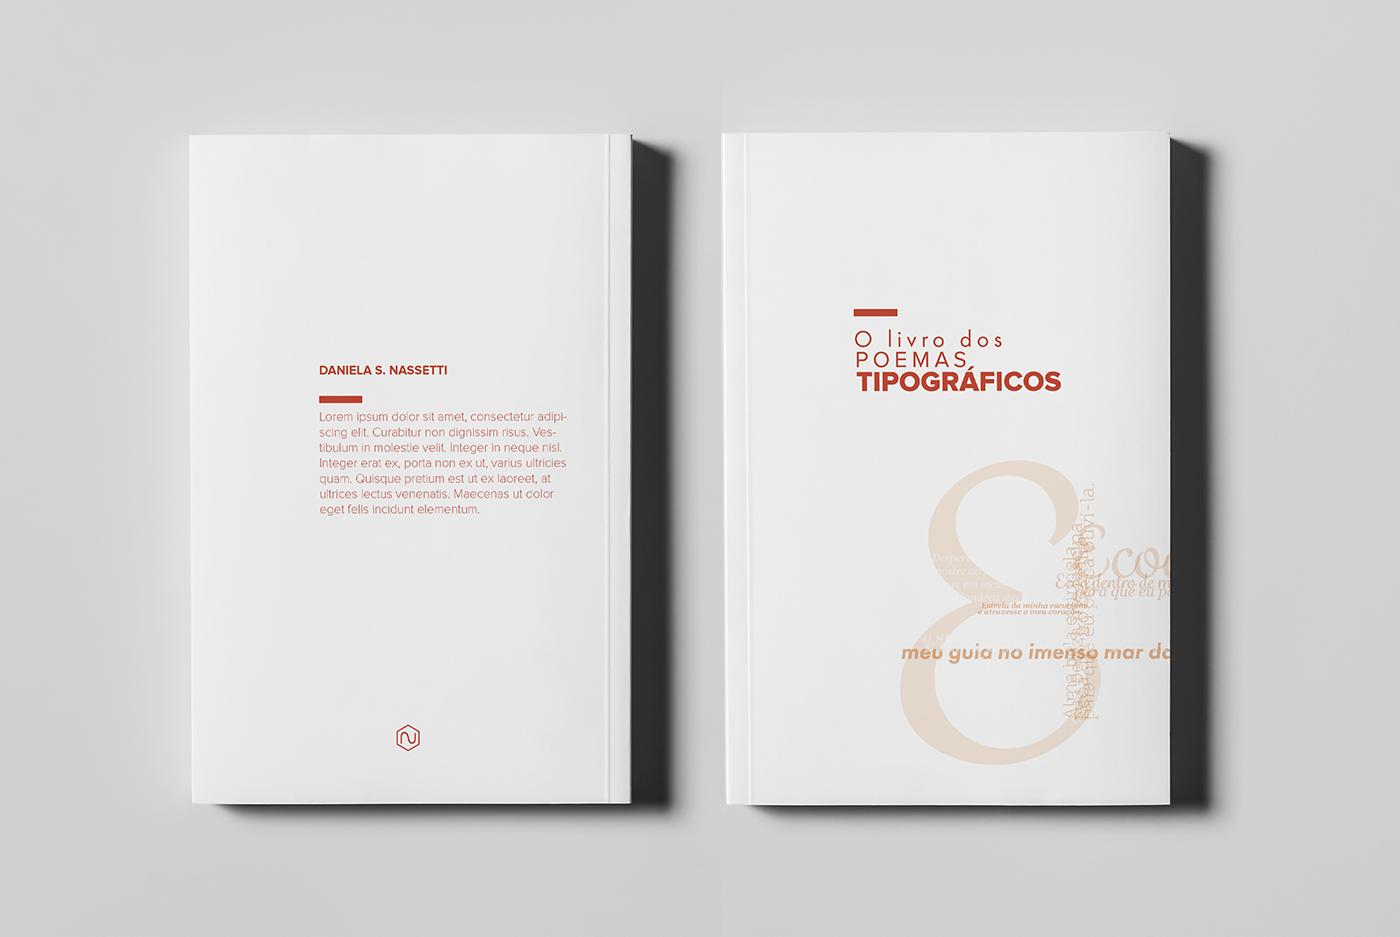 book typographic poems typographic personal poem poems editorial type art design Livro tipografia tipografico madethis colossal